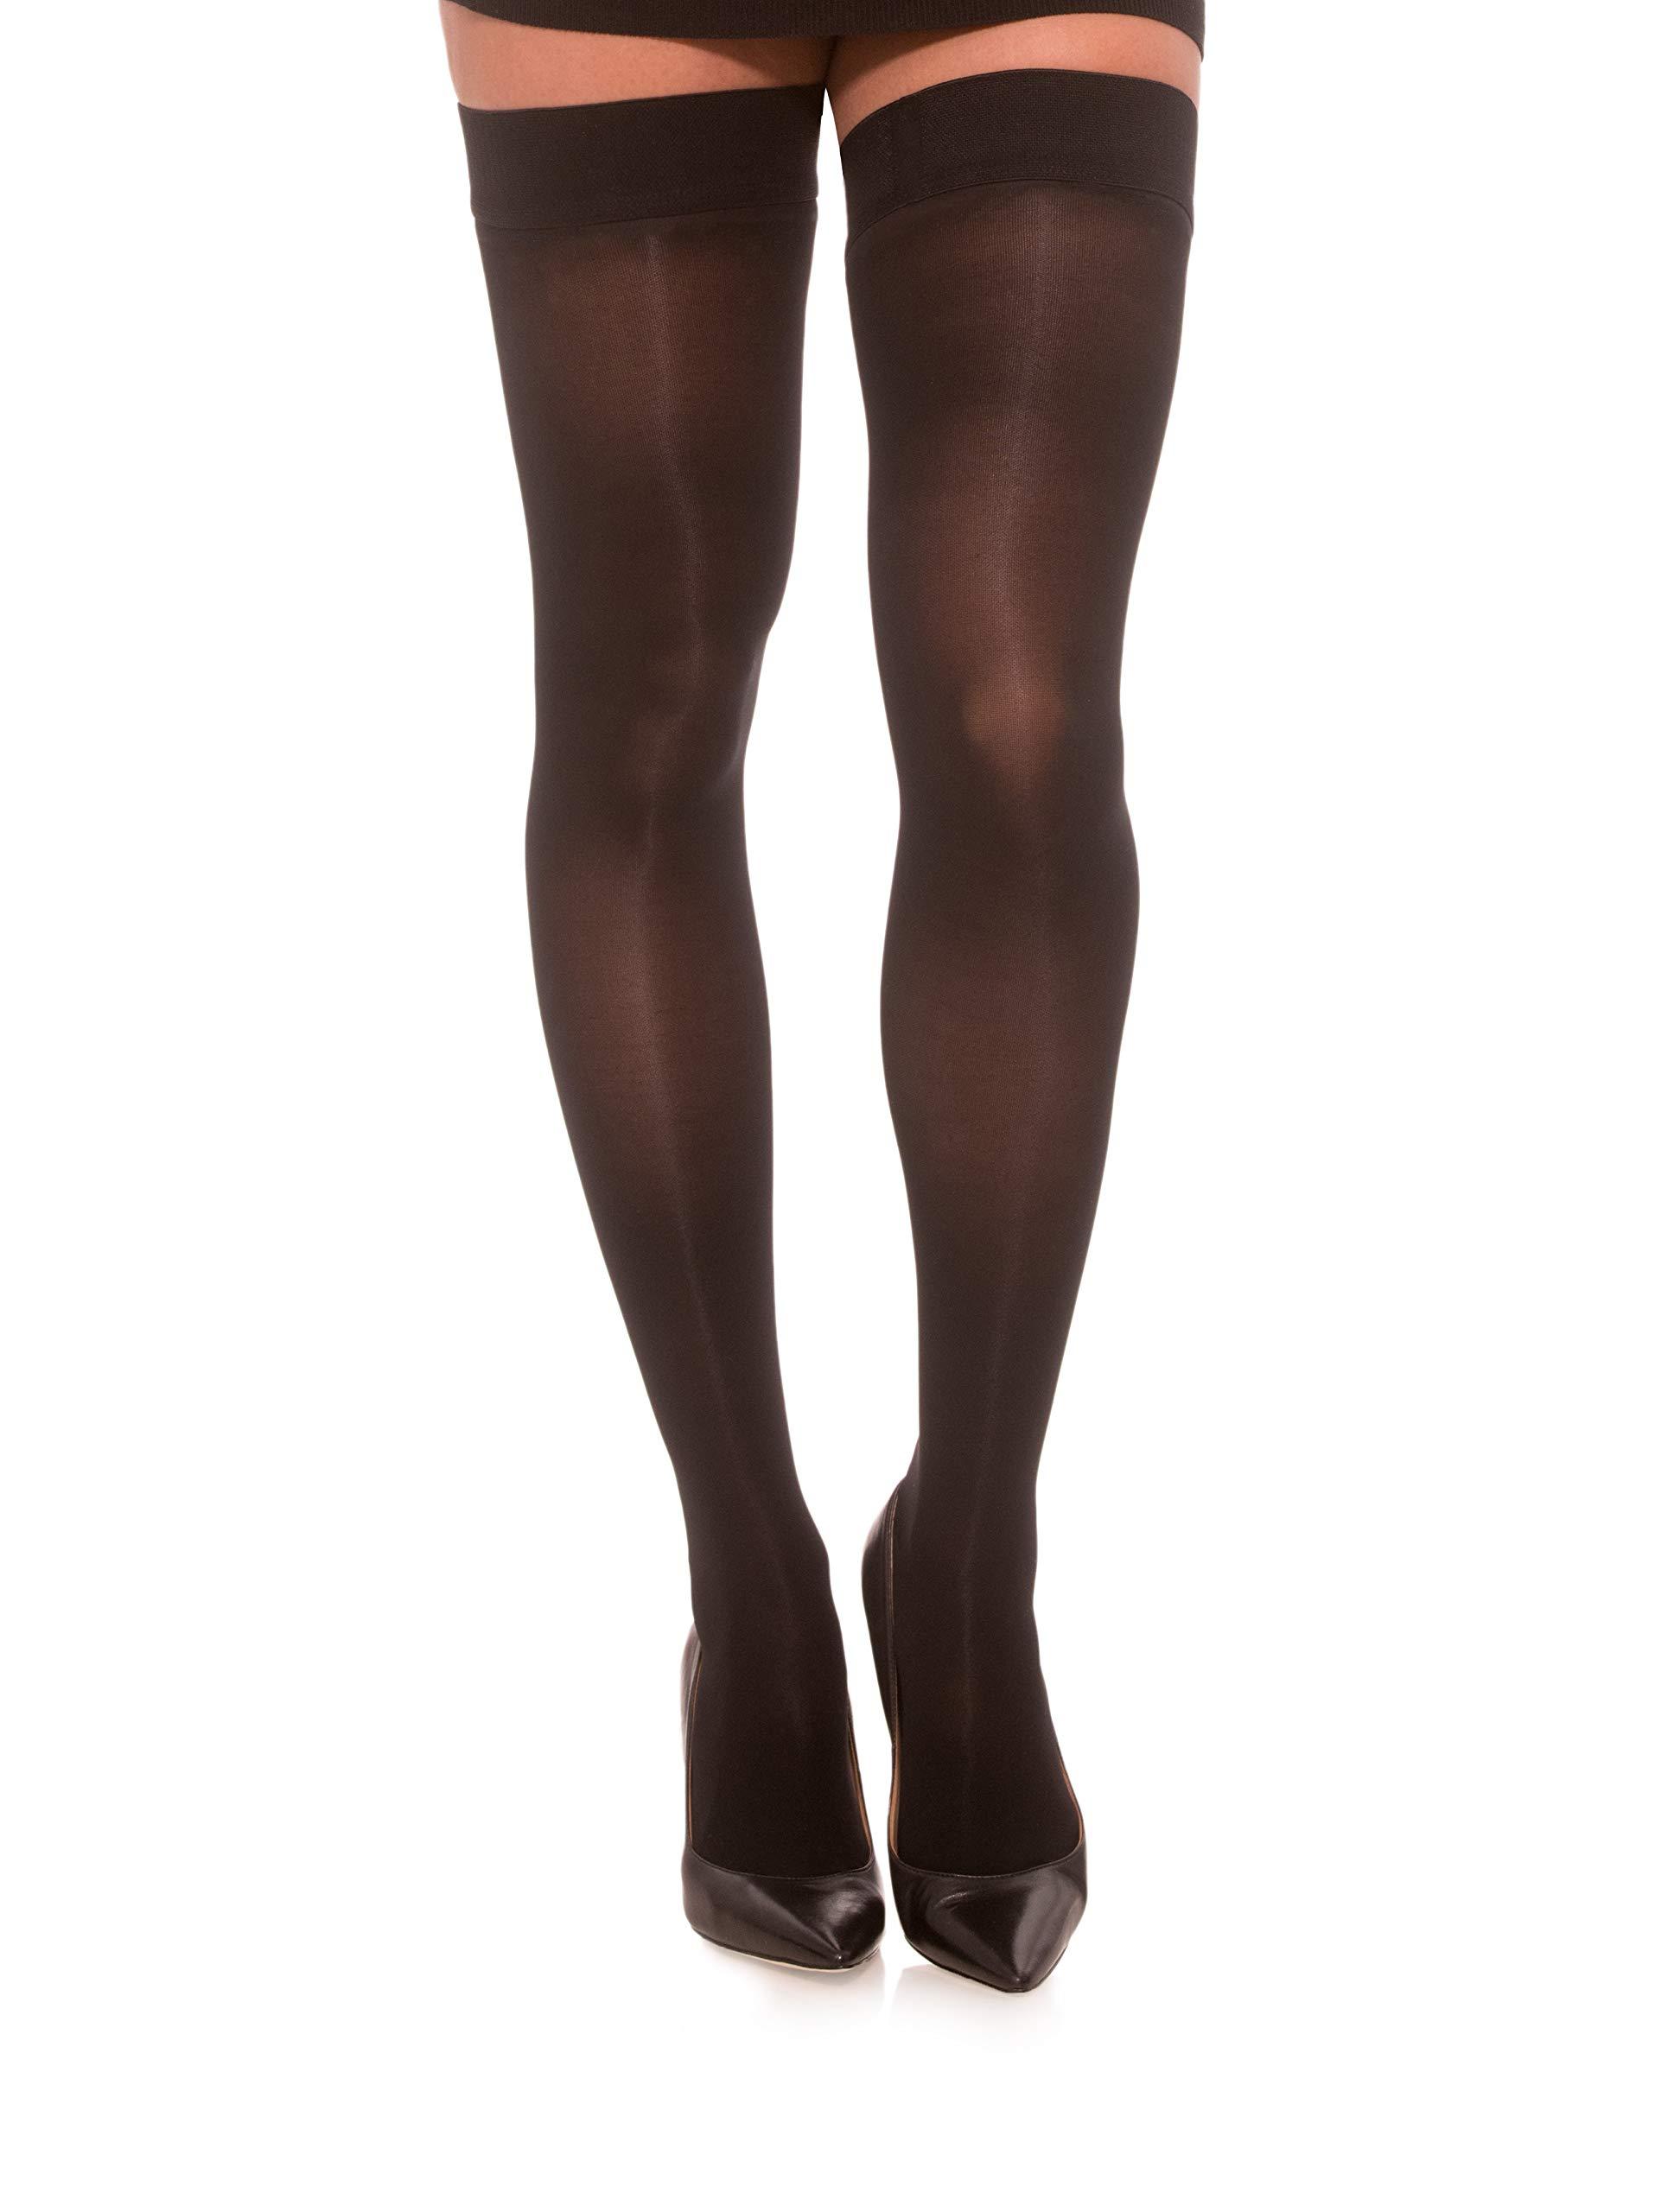 Jomi Compression Thigh High Stockings Collection, 20-30mmHg Sheer Closed Toe 245 (Medium, Black)